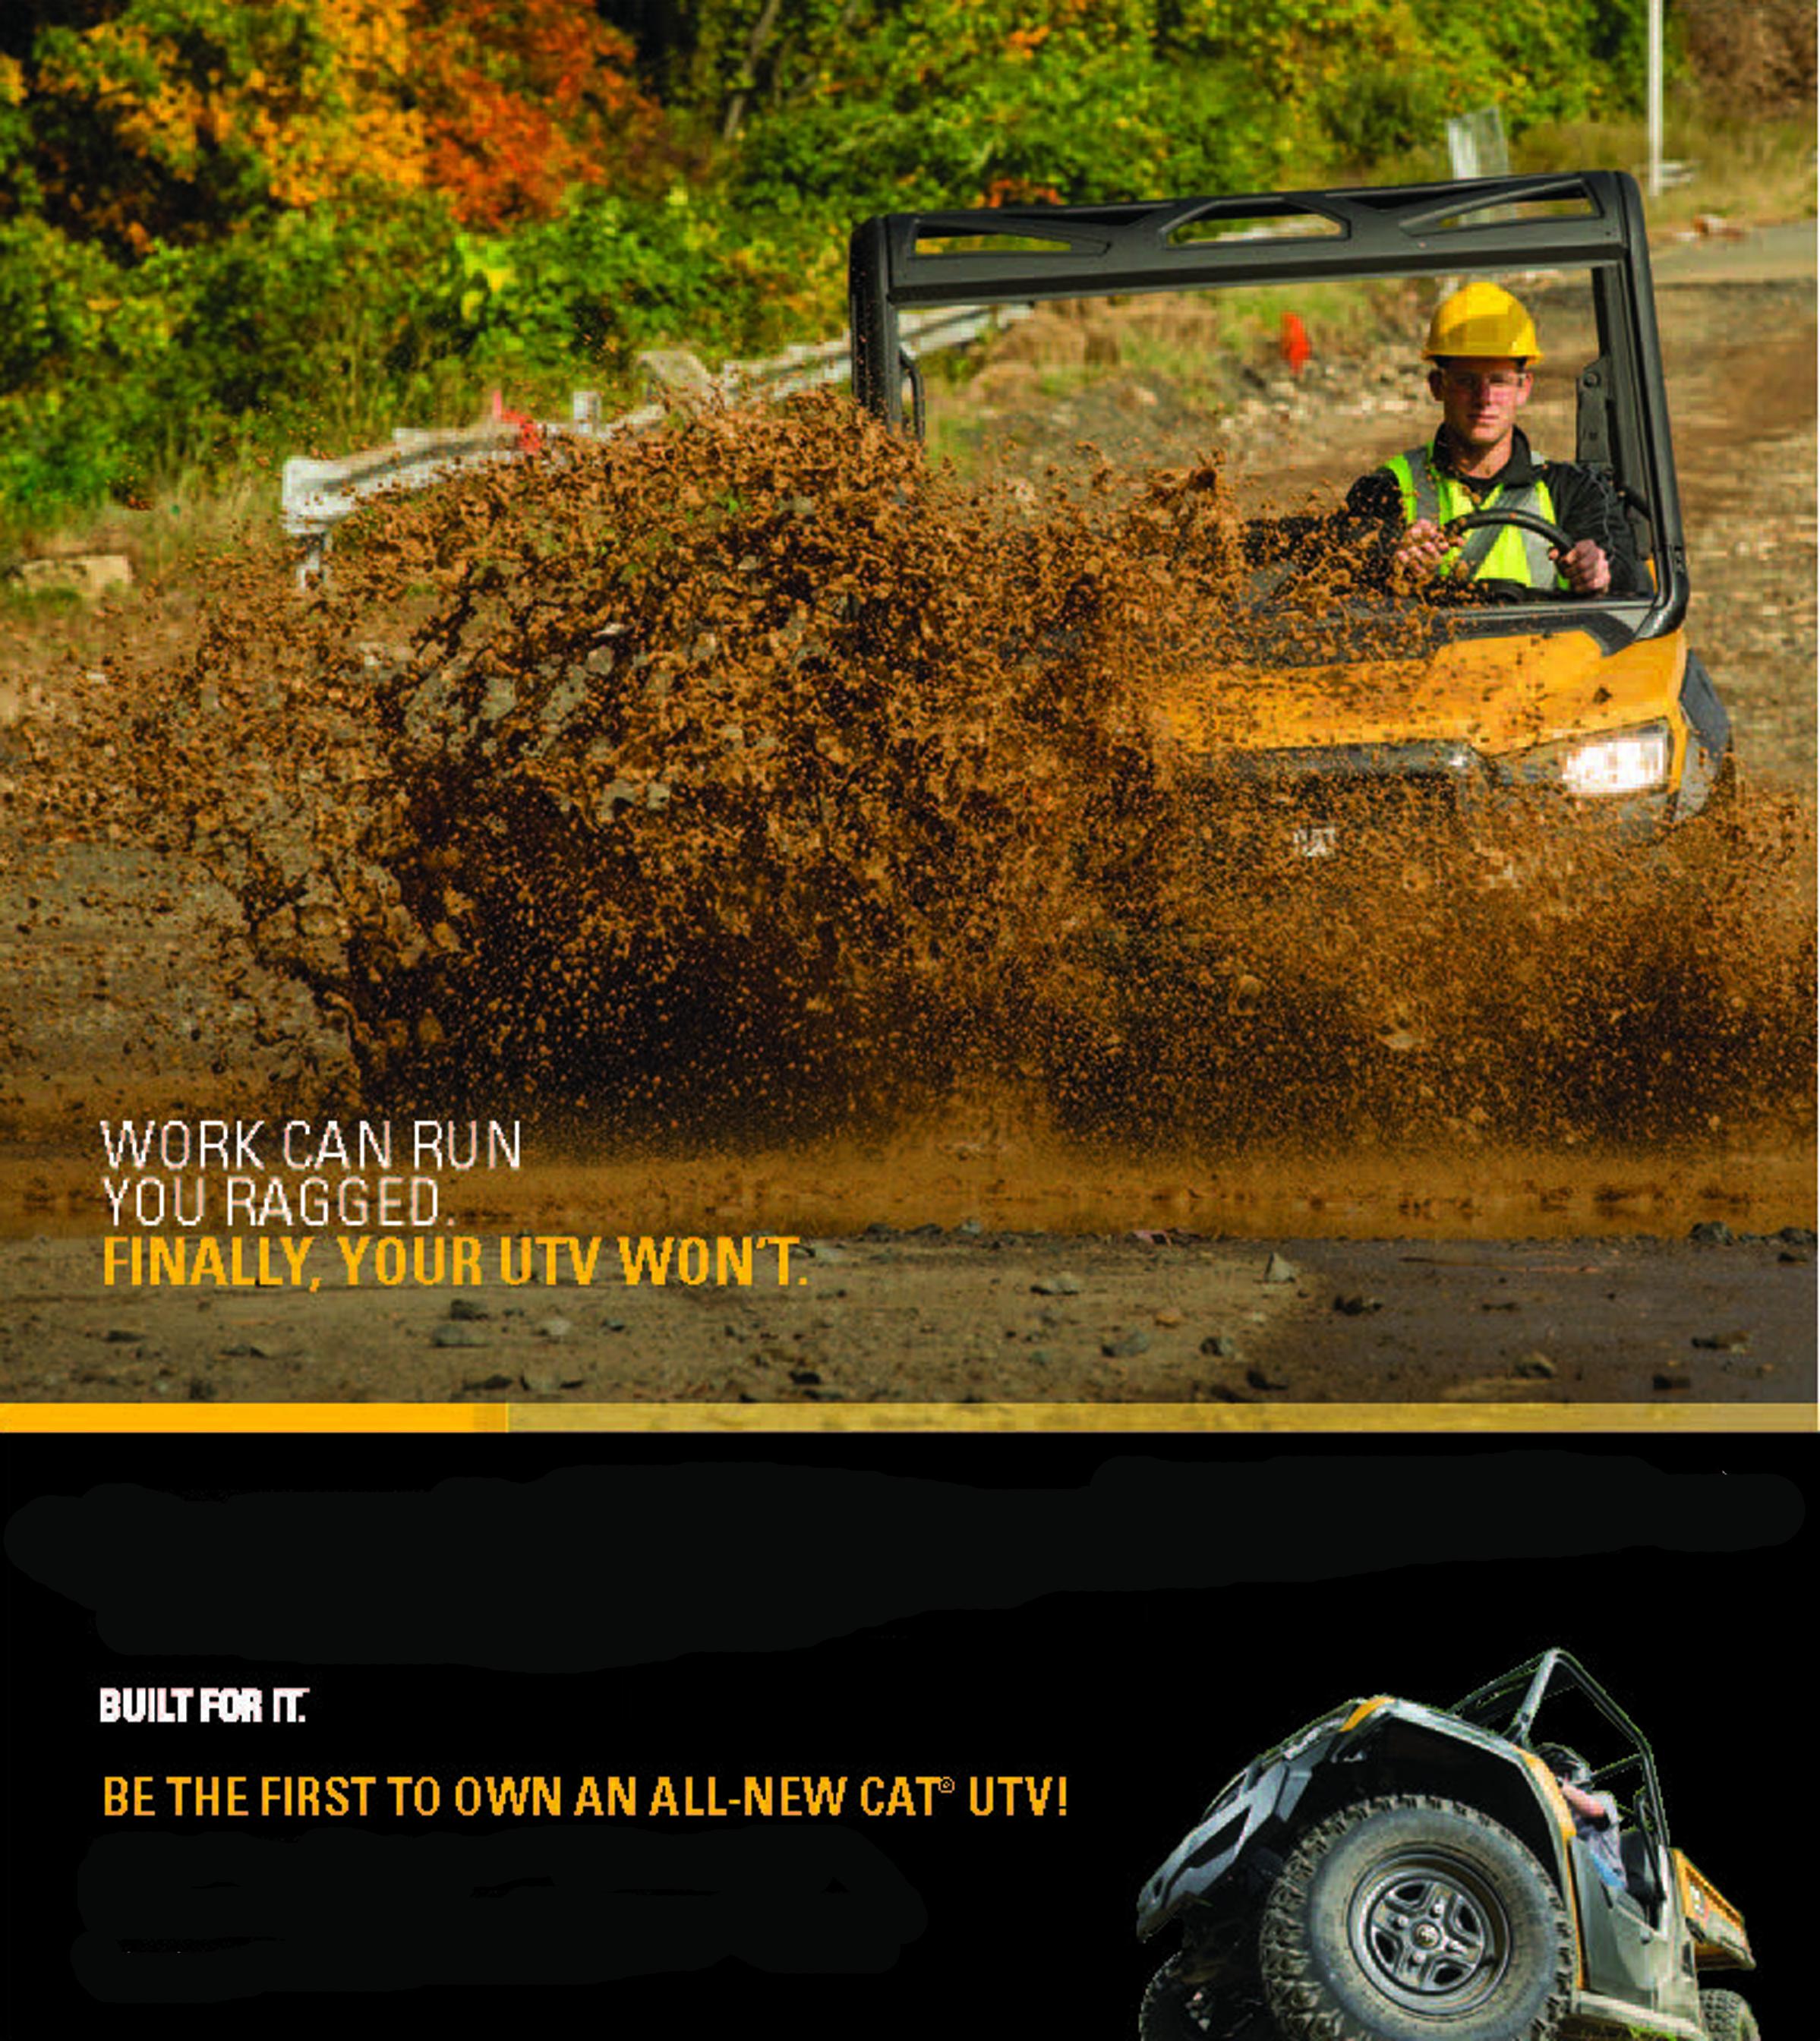 2018-utv-print-ad-now-available-construction-2-2